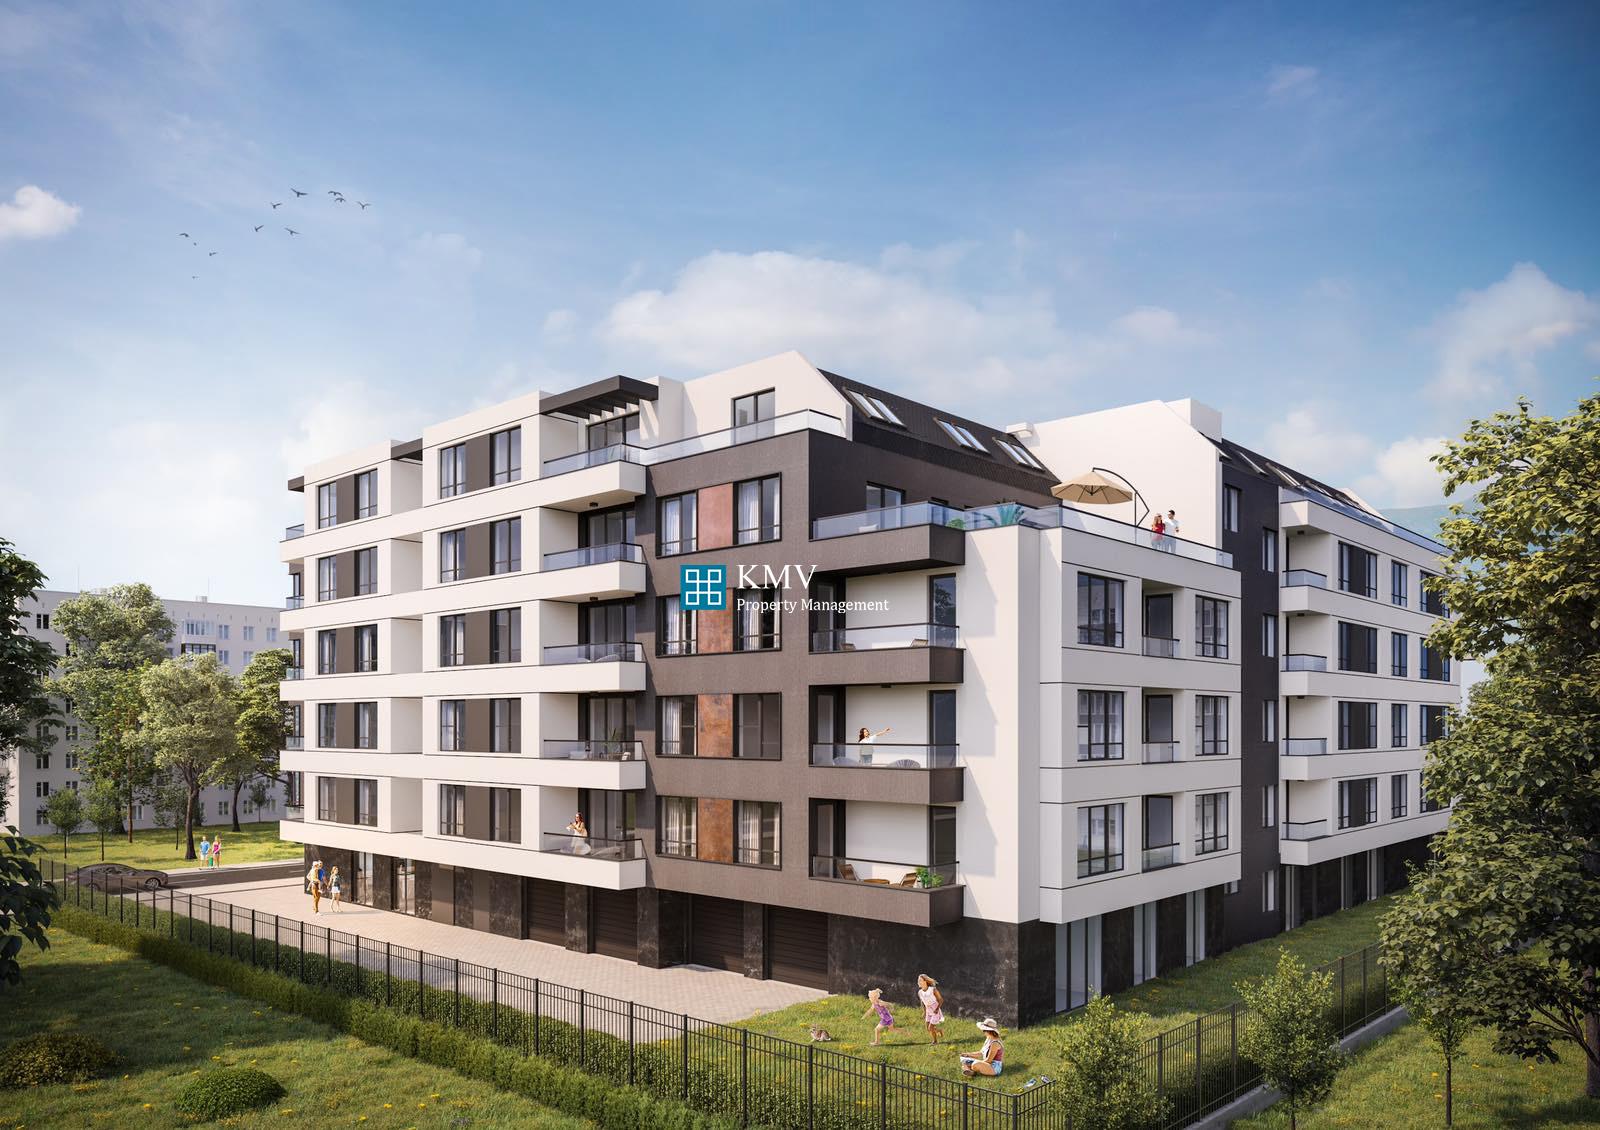 Двустаен апартамент в сграда Reya Residence кв. Кръстова вада